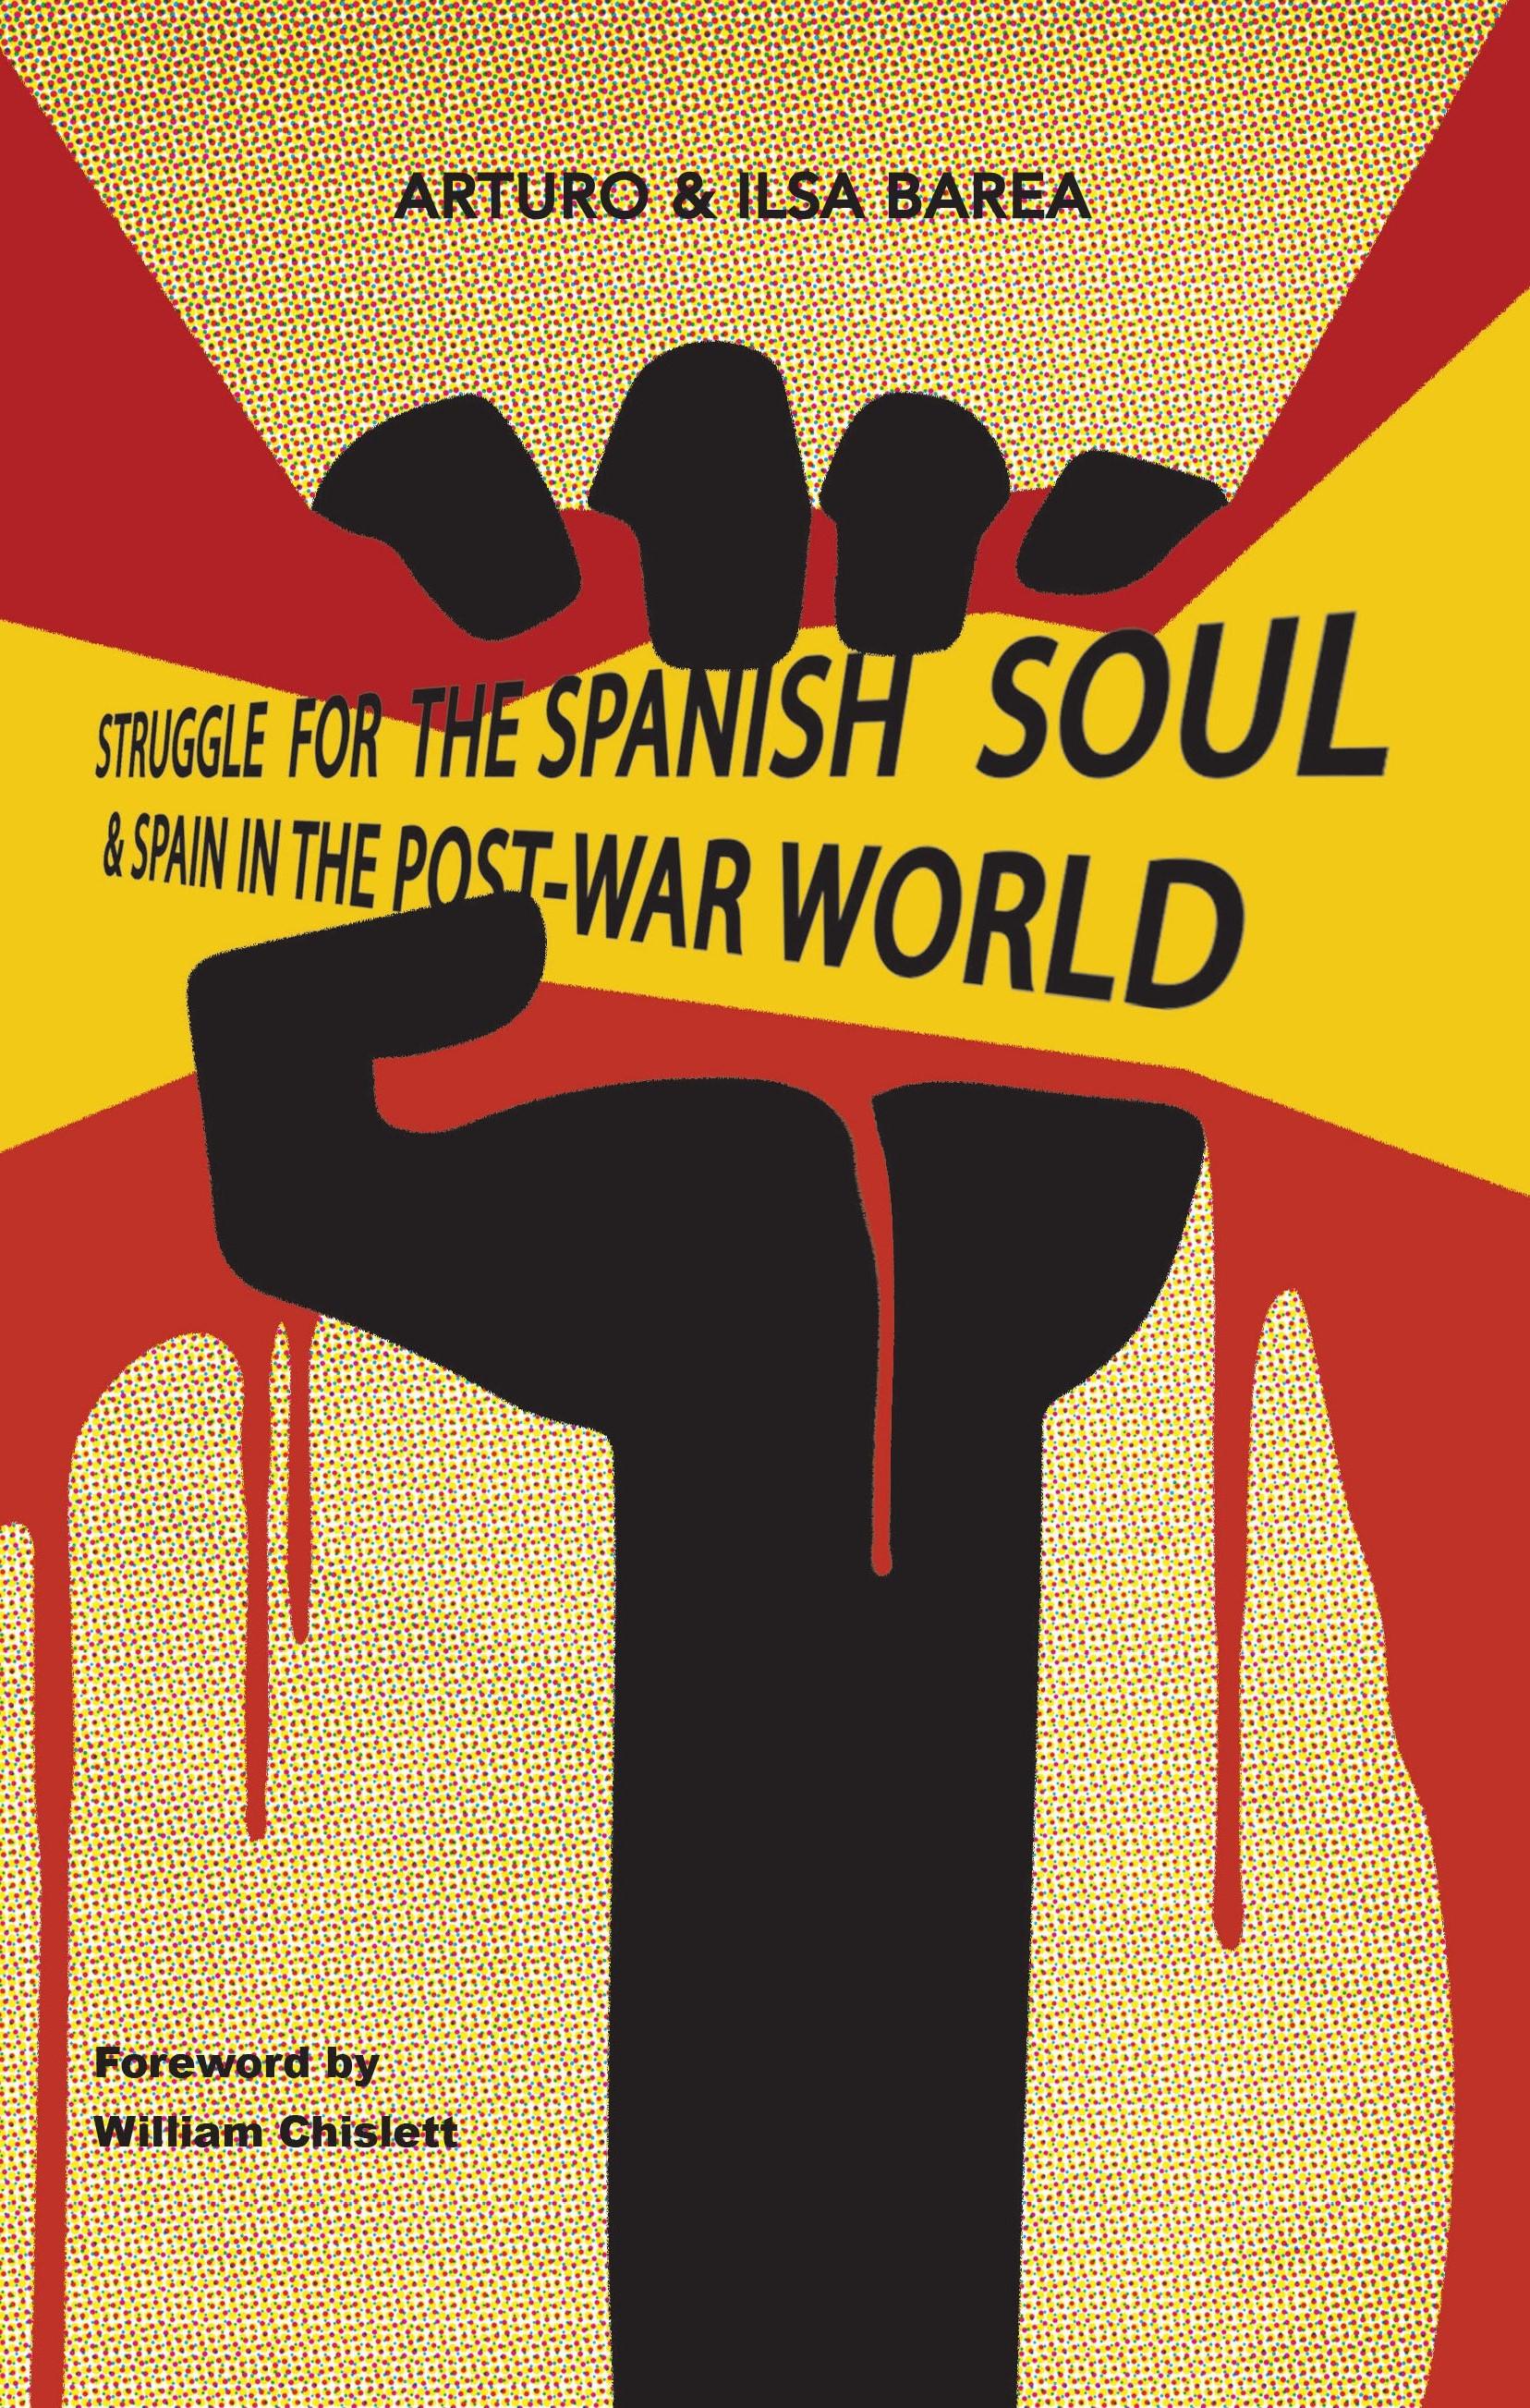 9781913693046 Spanish Soul (front)